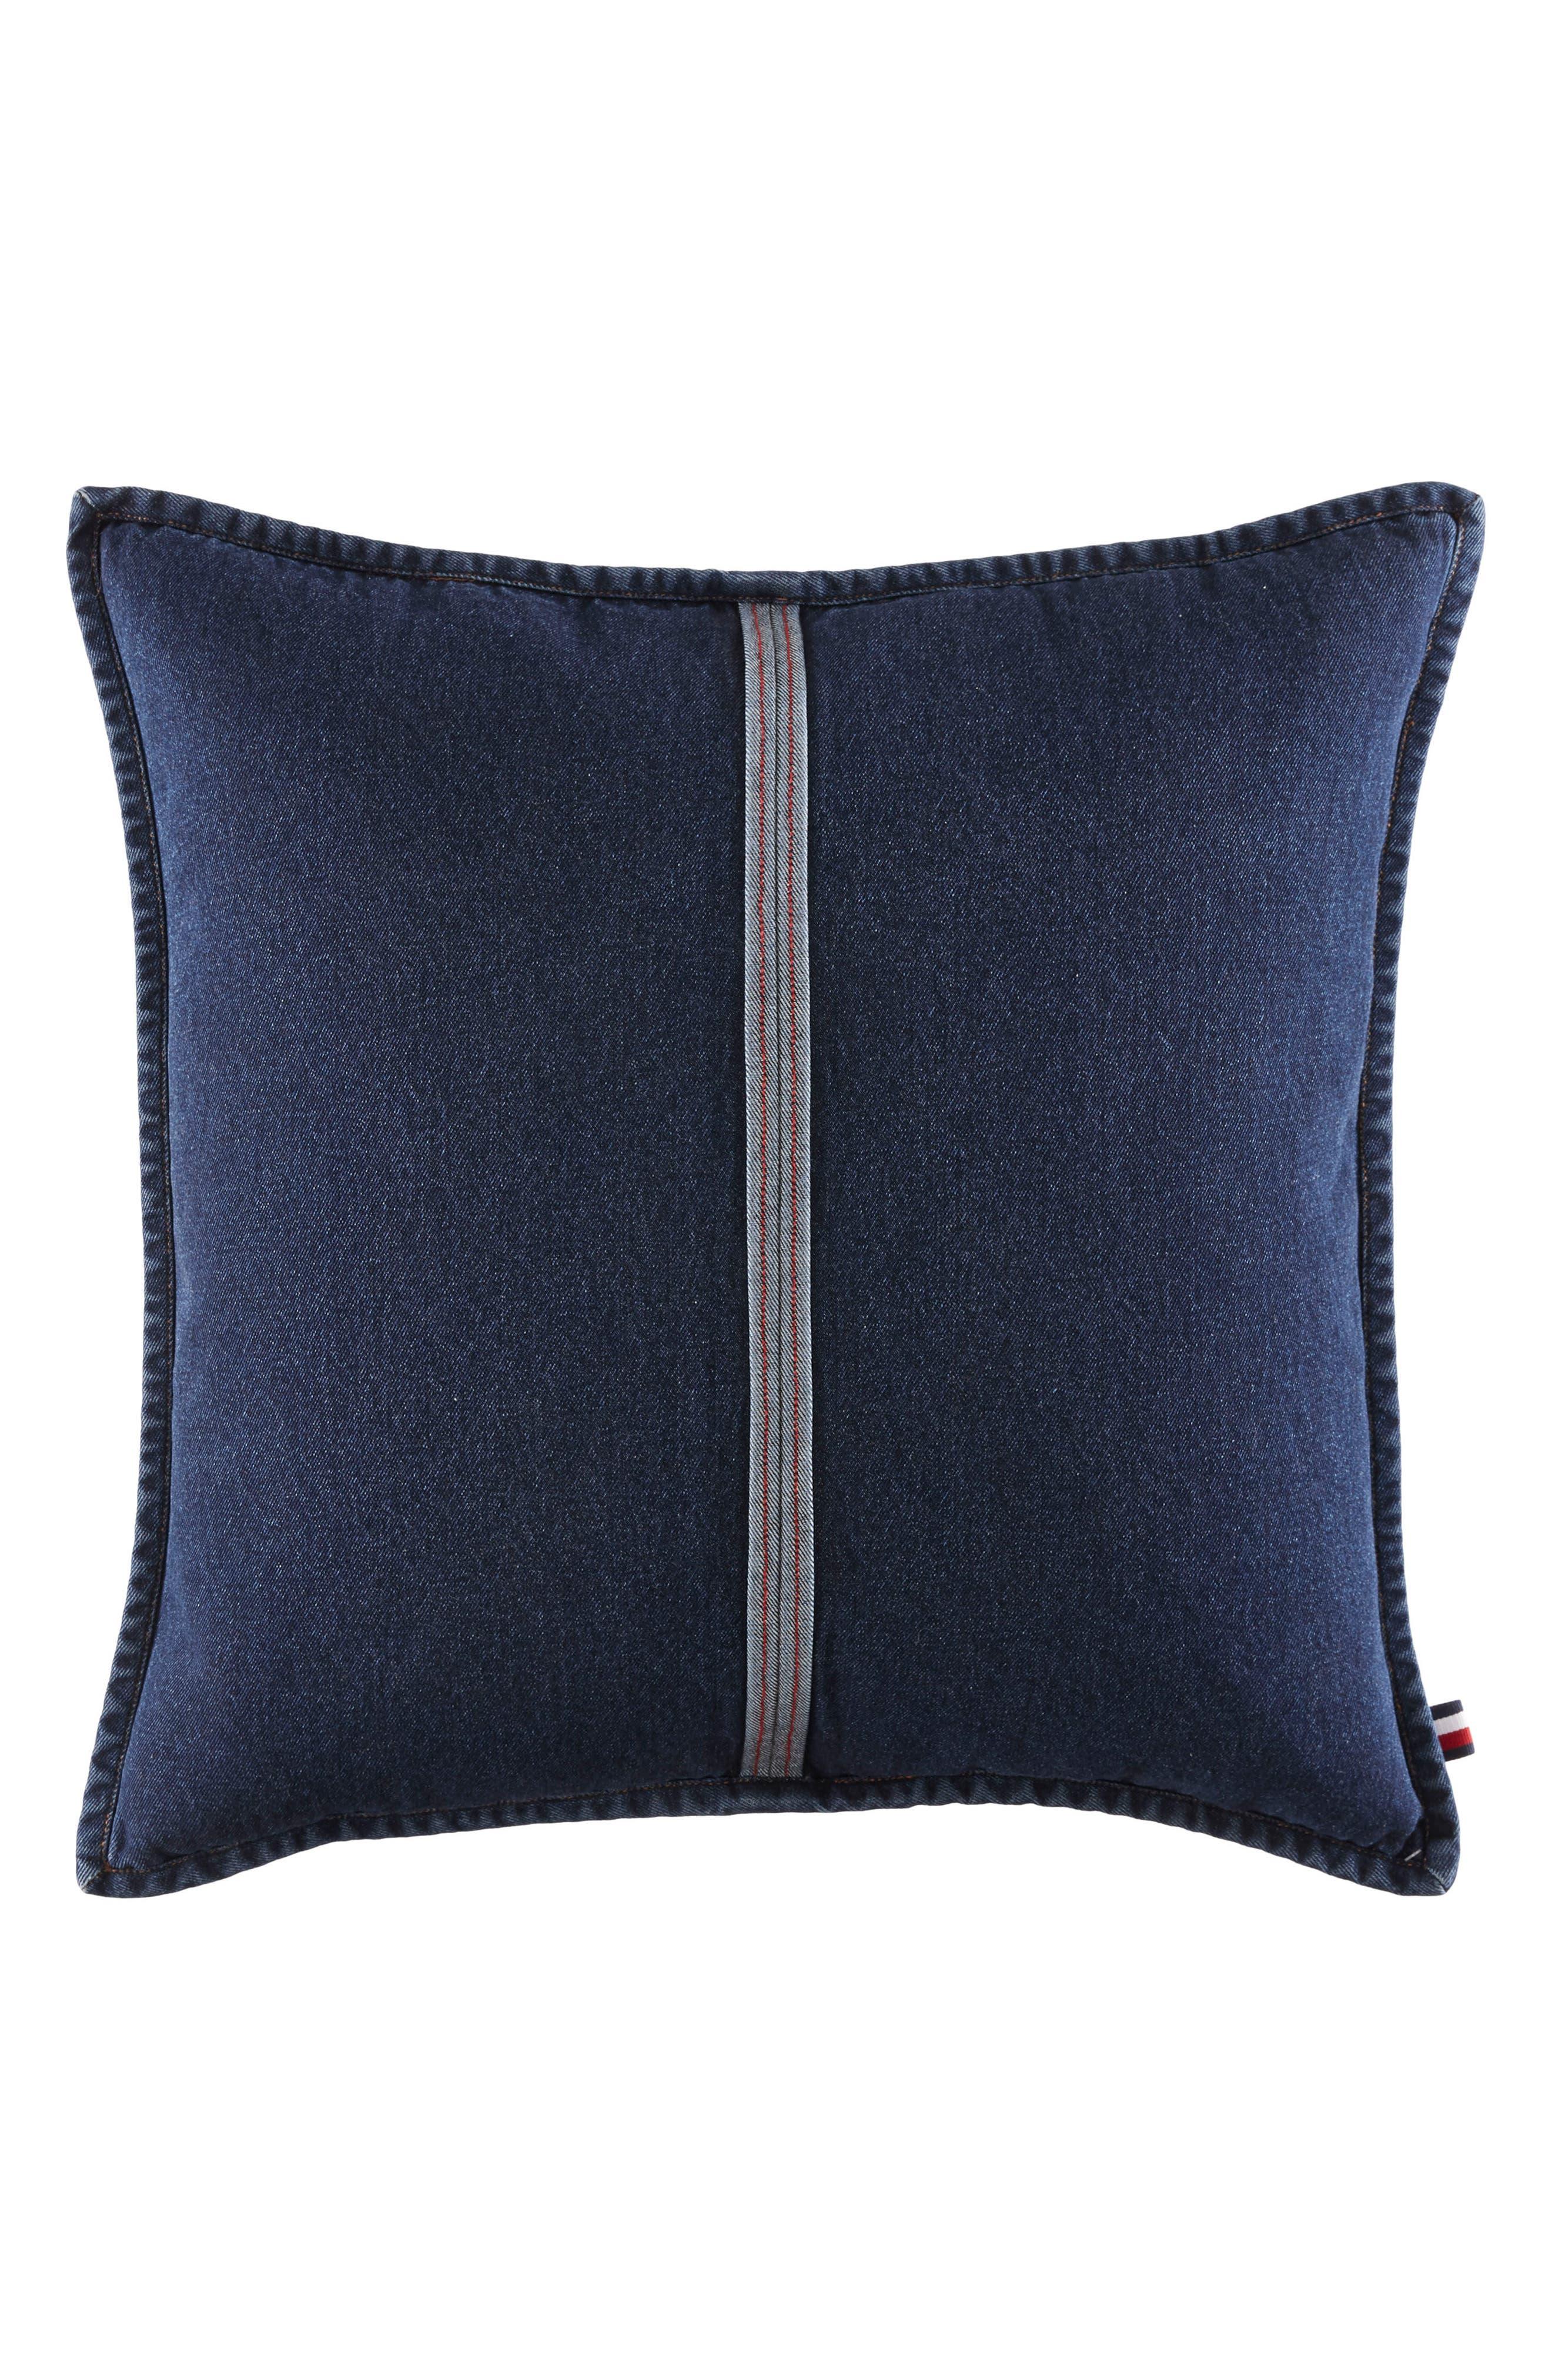 Selvage Stripe Denim Accent Pillow,                         Main,                         color, 410